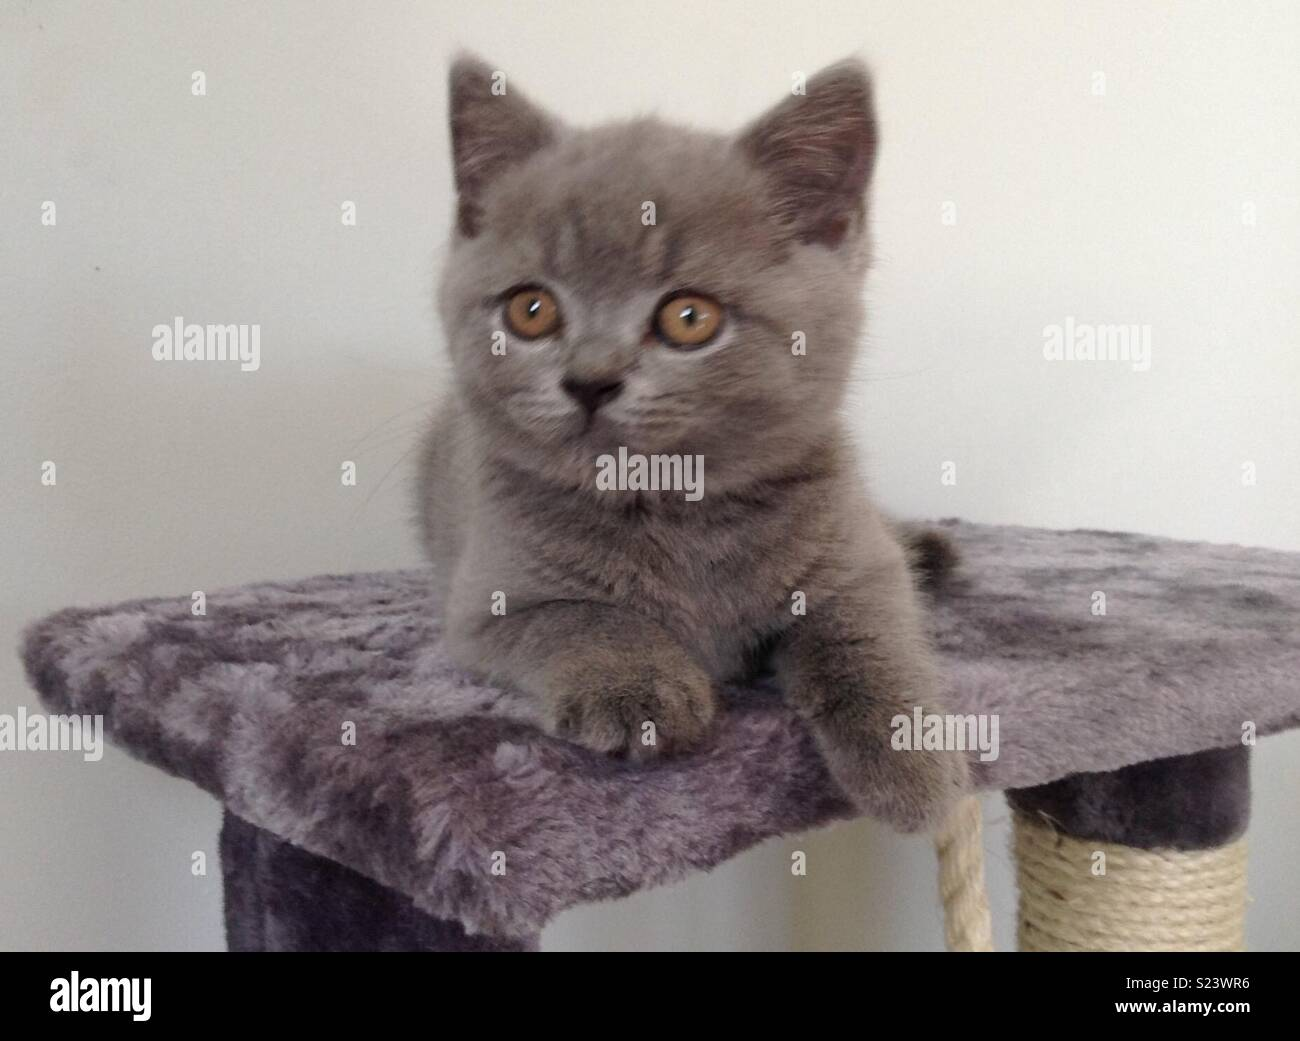 British Shorthaired Blue Kitten - Stock Image